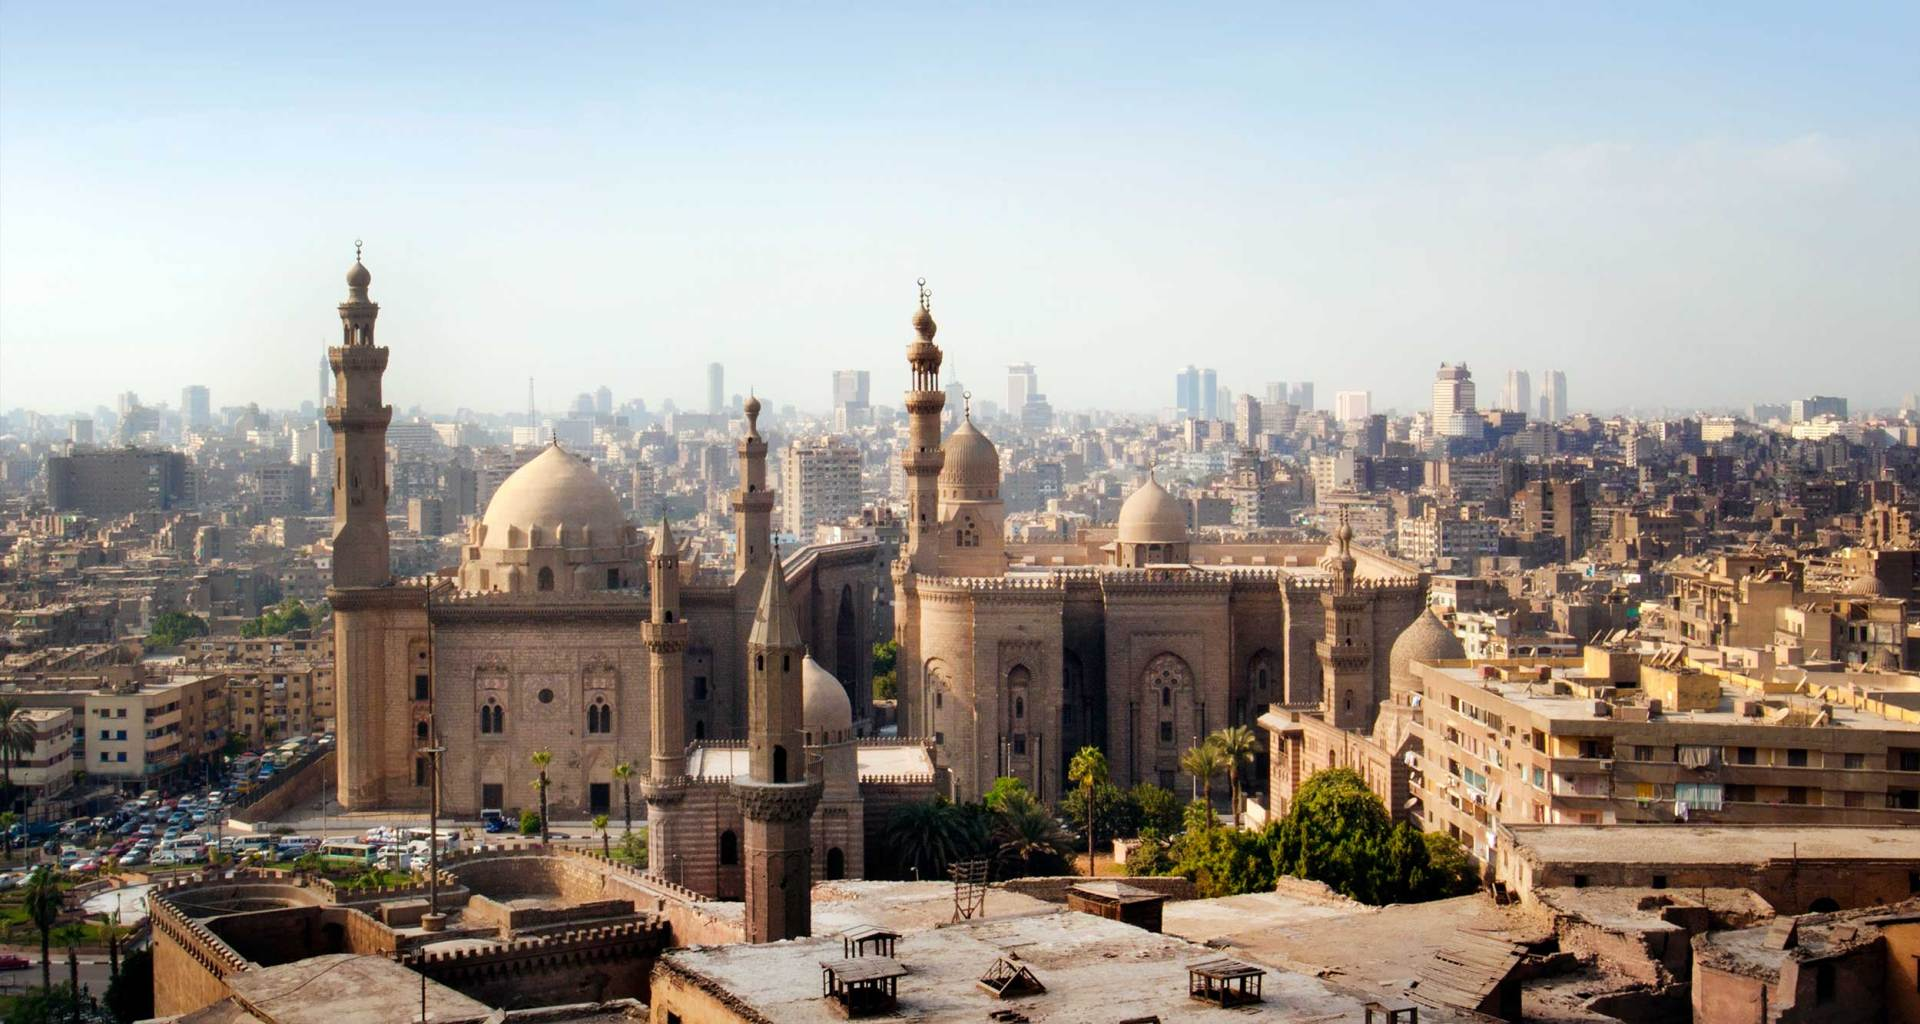 Cairo, Egypt skyline.